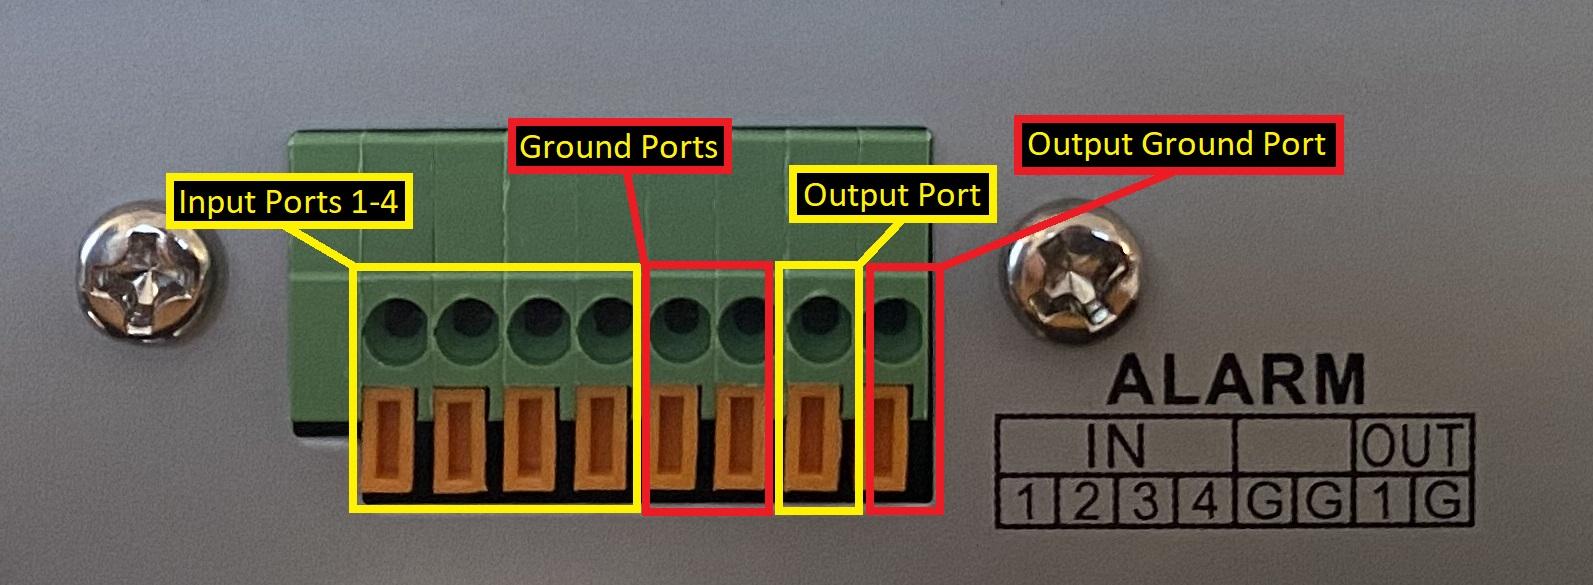 alarm ports.jpg